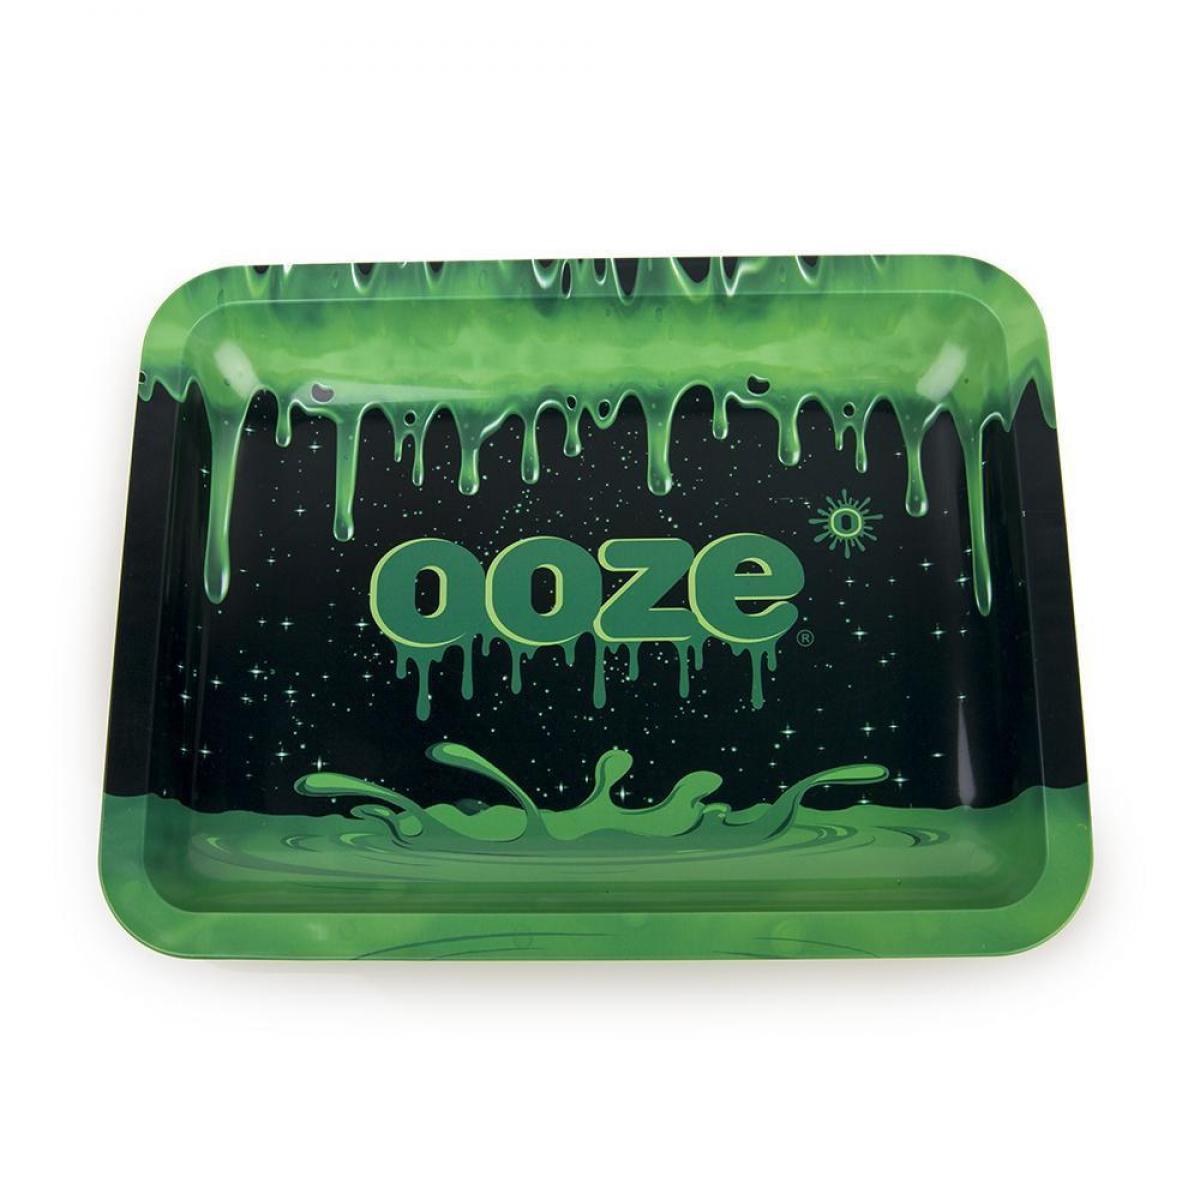 Ooze Rolling Tray - MEDIUM